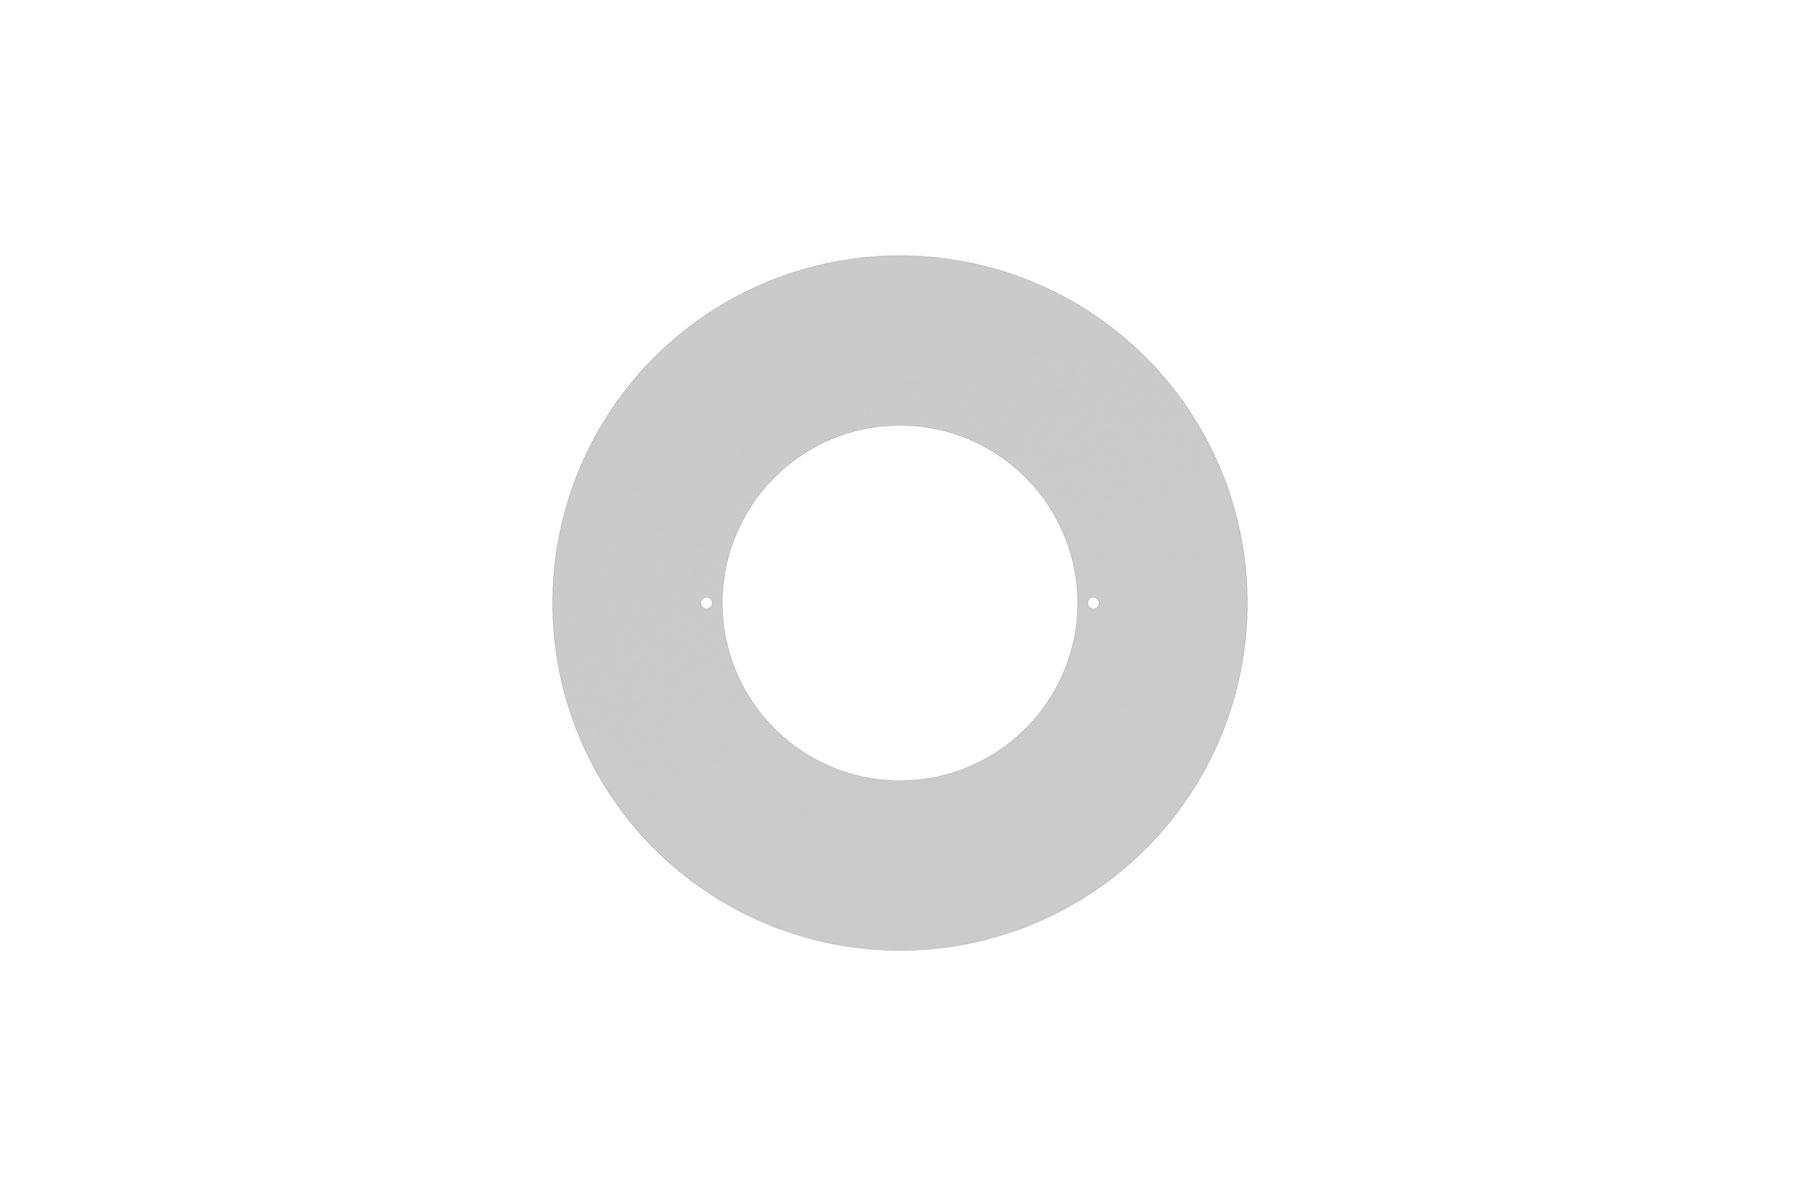 "Goof Ring Overall Diameter 8 1/2"" for DLCLR 4 Inch LED Commercial Recessed Light"